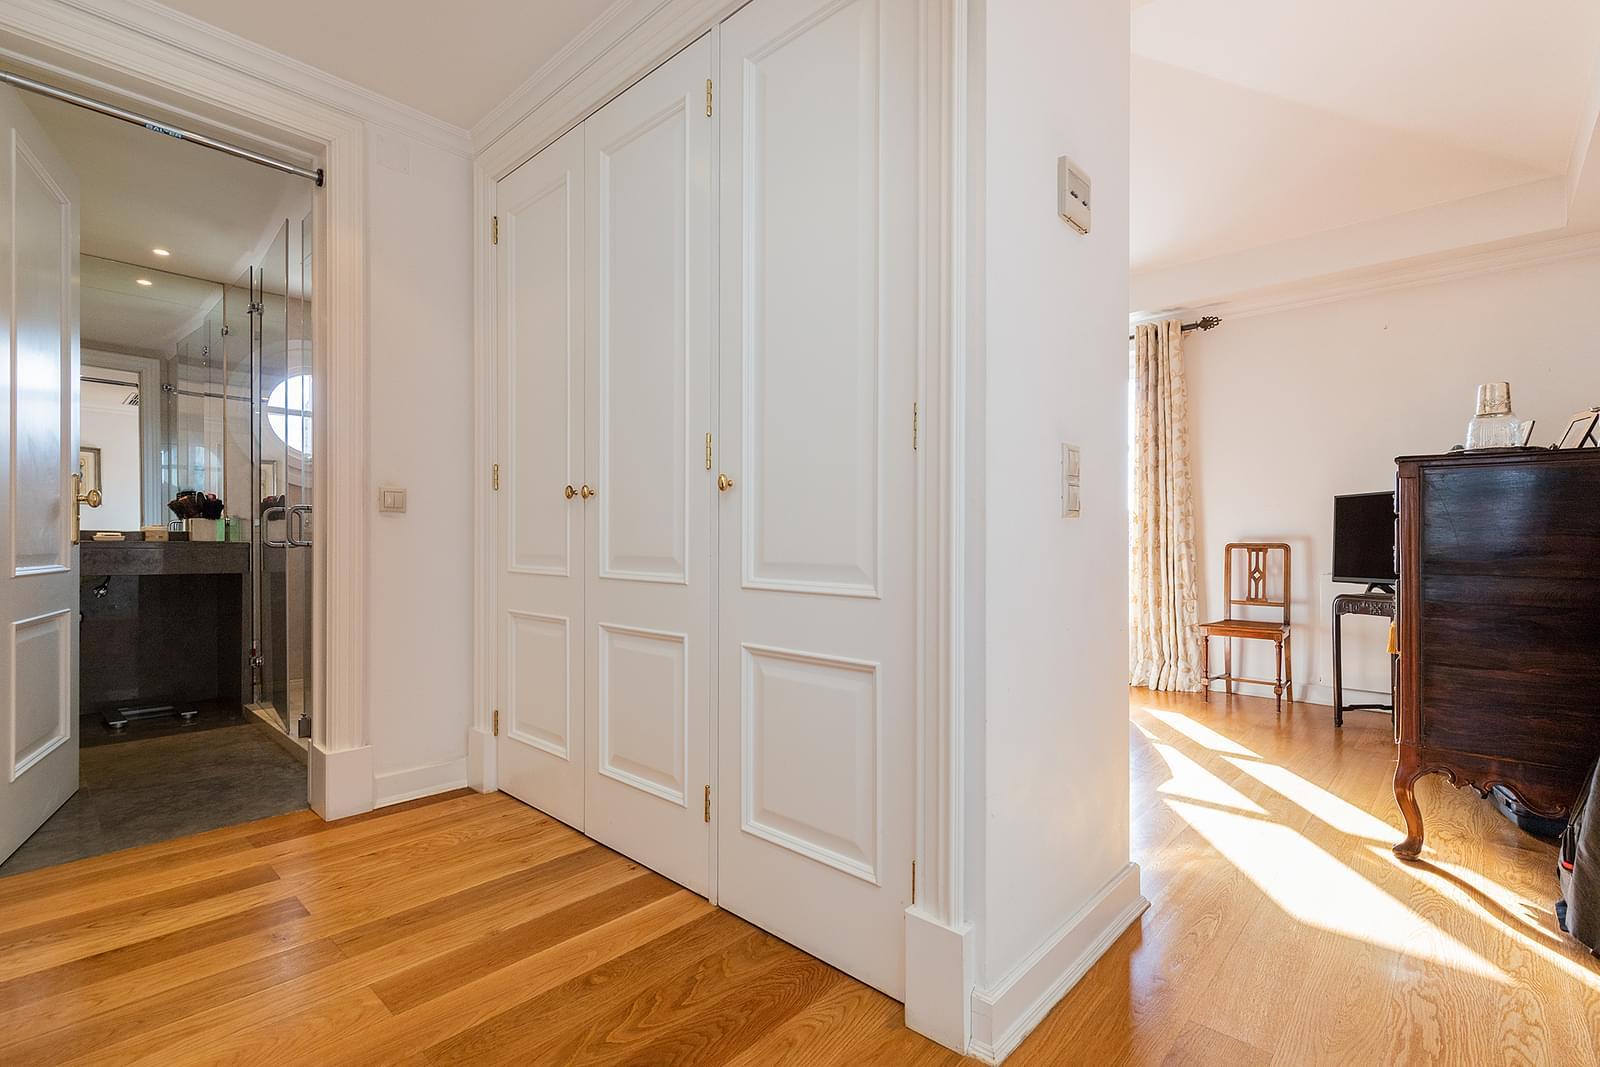 pf18618-apartamento-t4-1-lisboa-5c96b753-5024-48b8-8178-4f74cb63995b